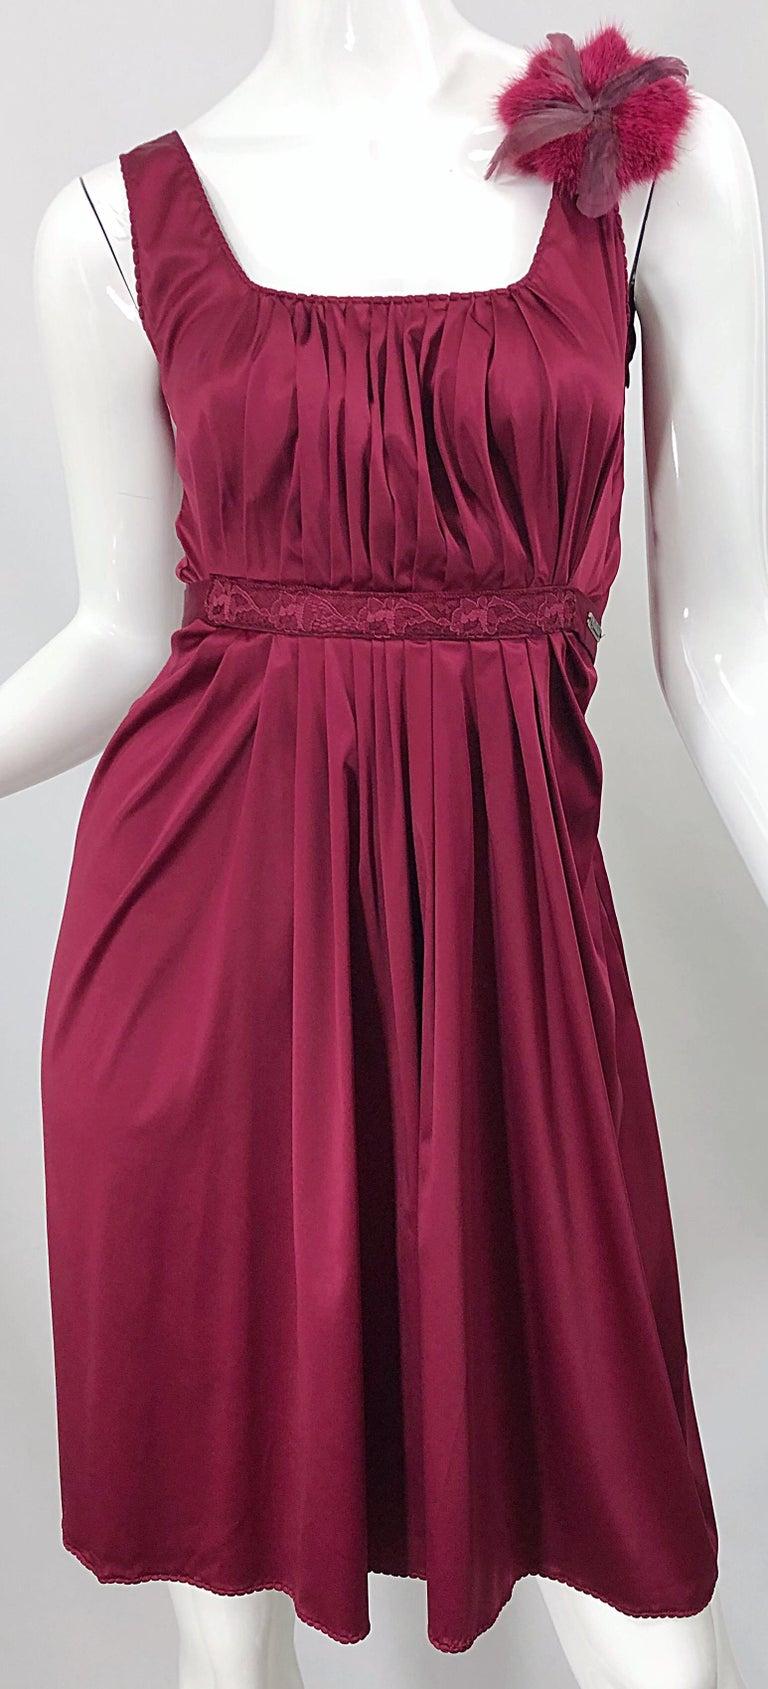 2000s John Galliano Sz 42 (US 6 / 8) Burgundy Silk Feather Brooch Babydoll Dress For Sale 2